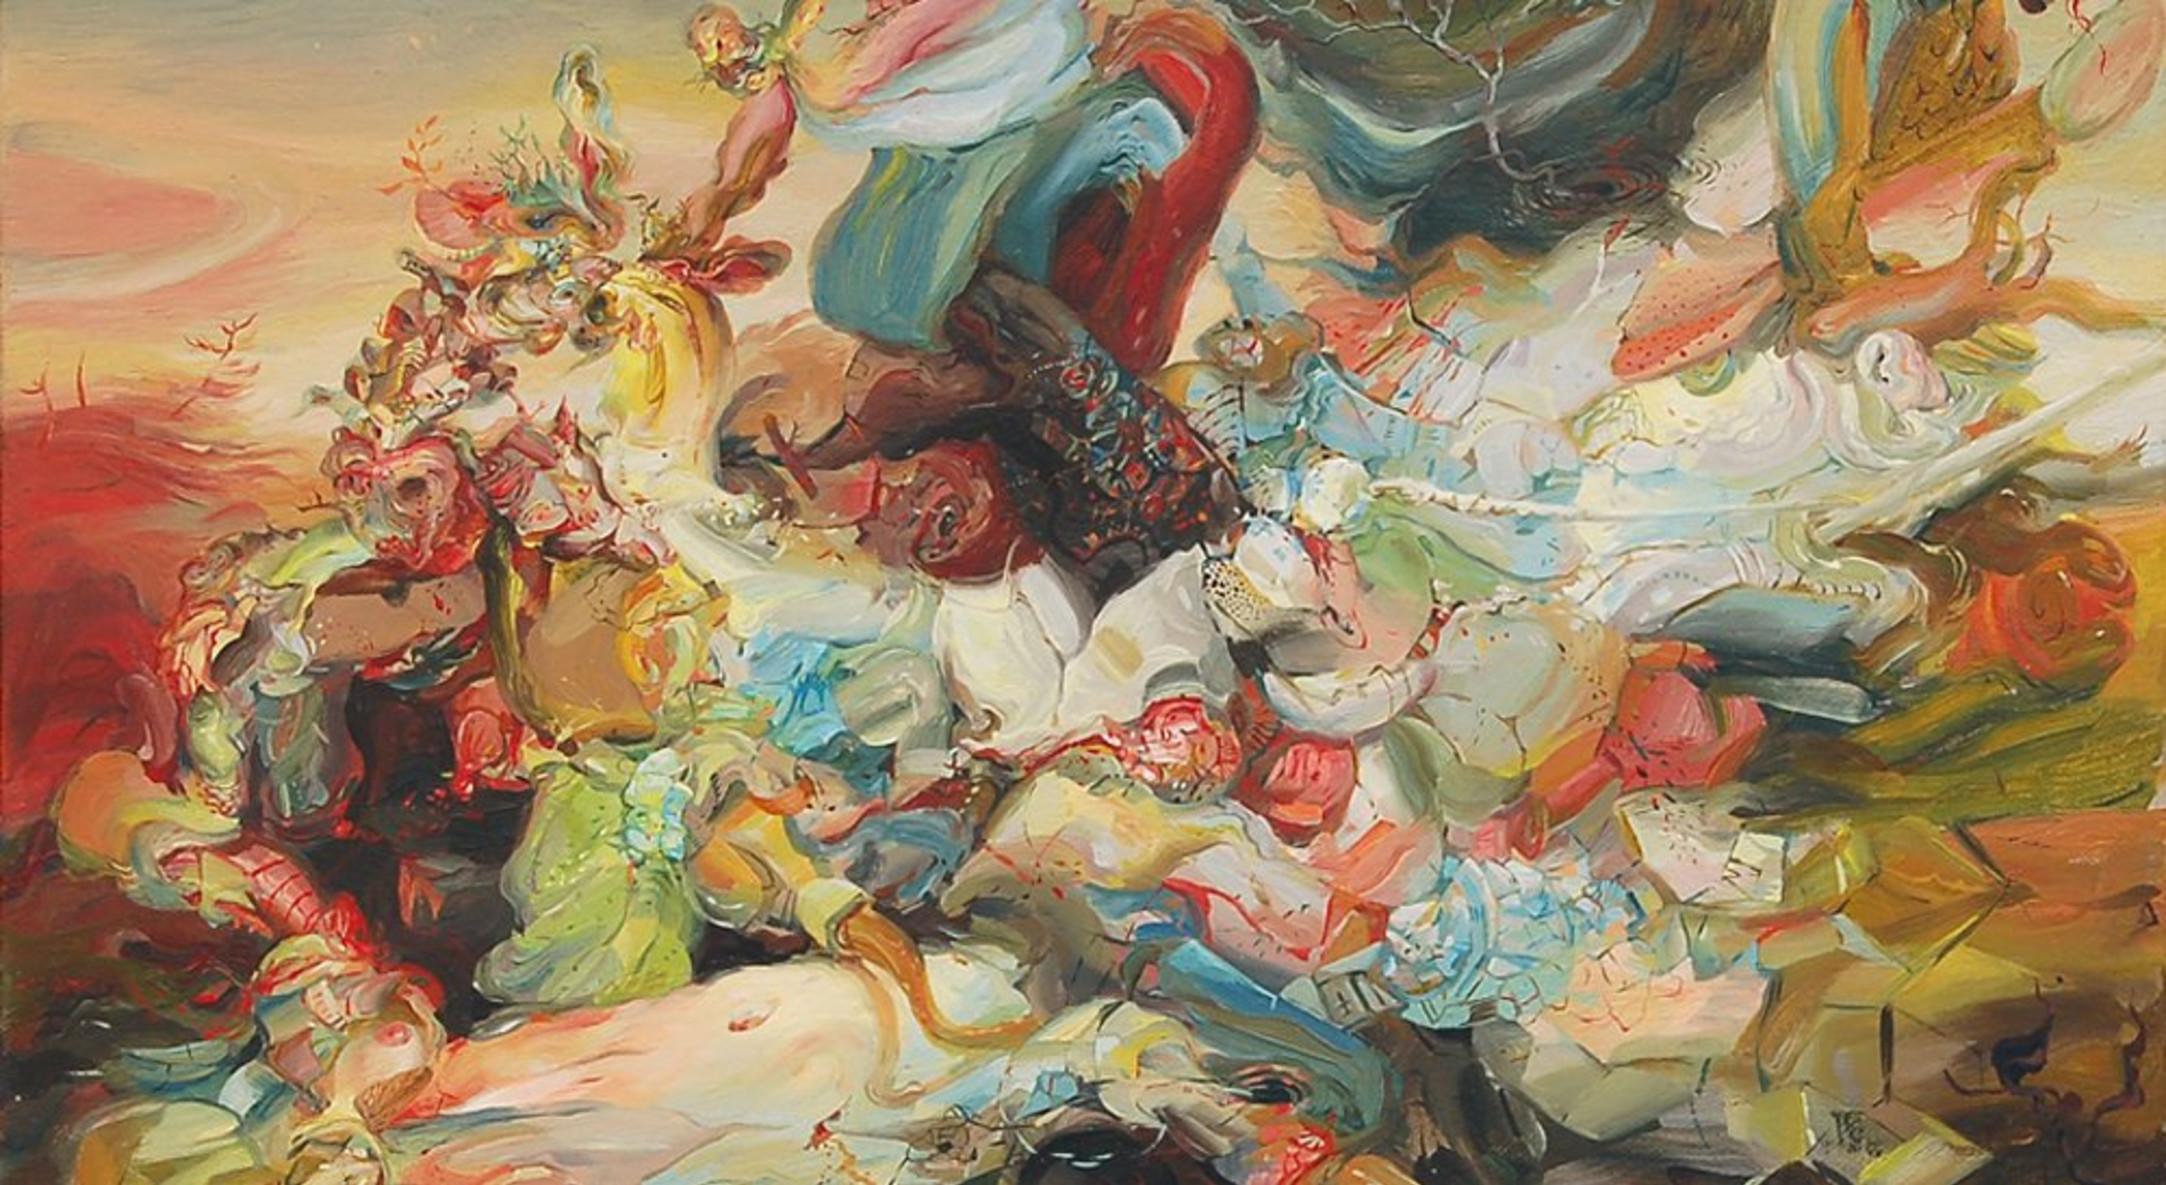 Darina Karpov, Dawn, 2010, Oil on canvas 22.2 x 25.4 cm, 8.75 x 10 in